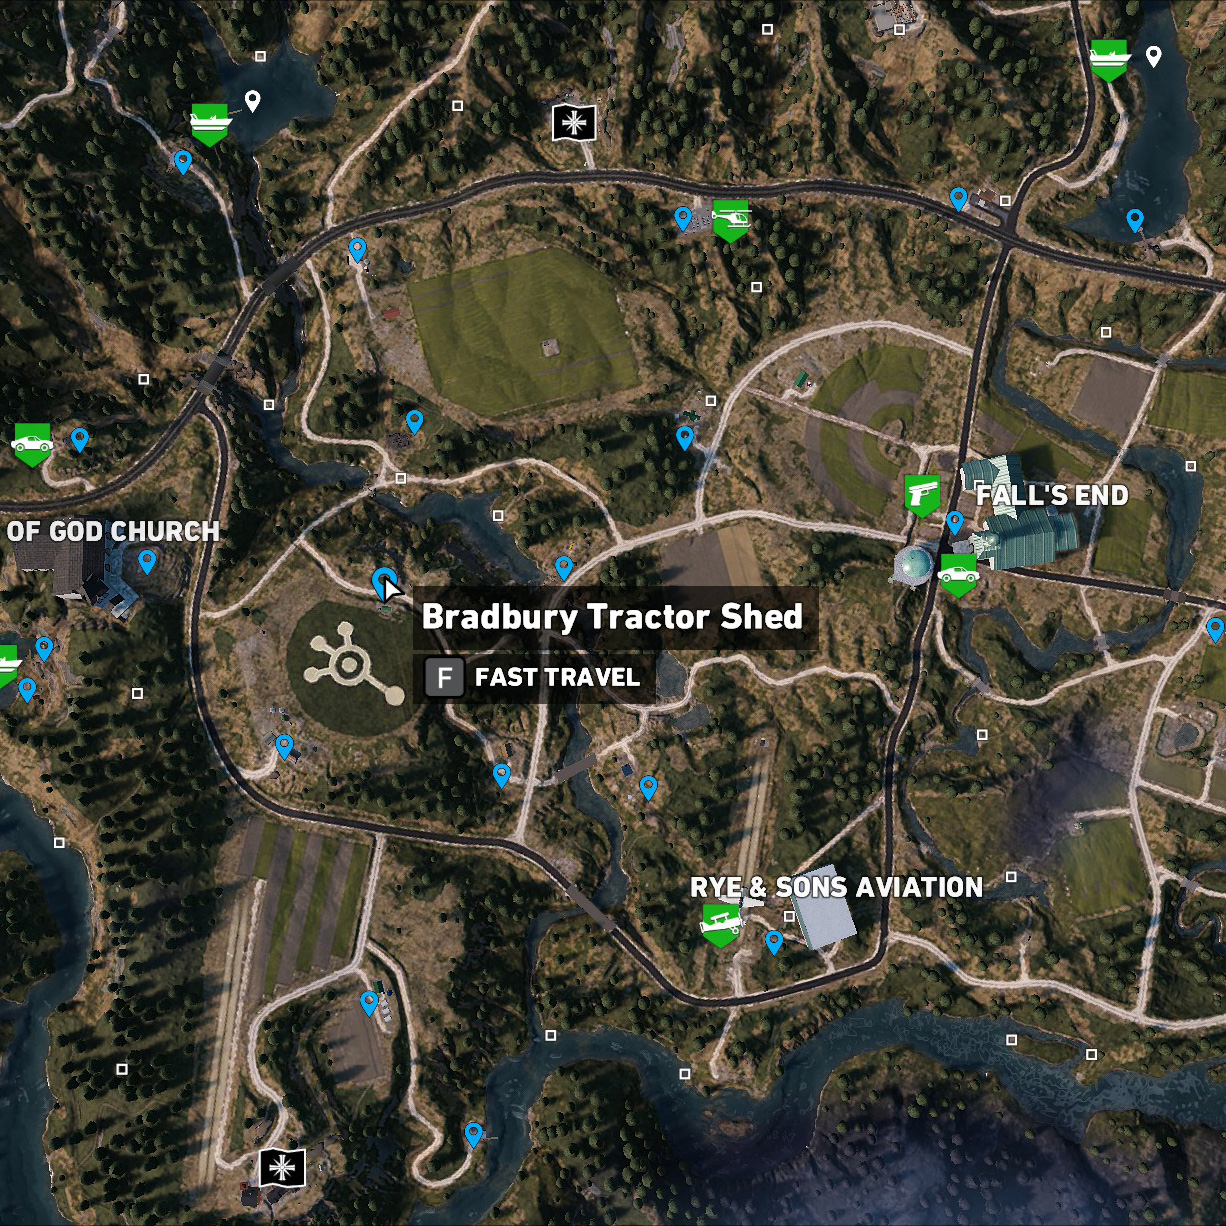 Bradbury Tractor Shed